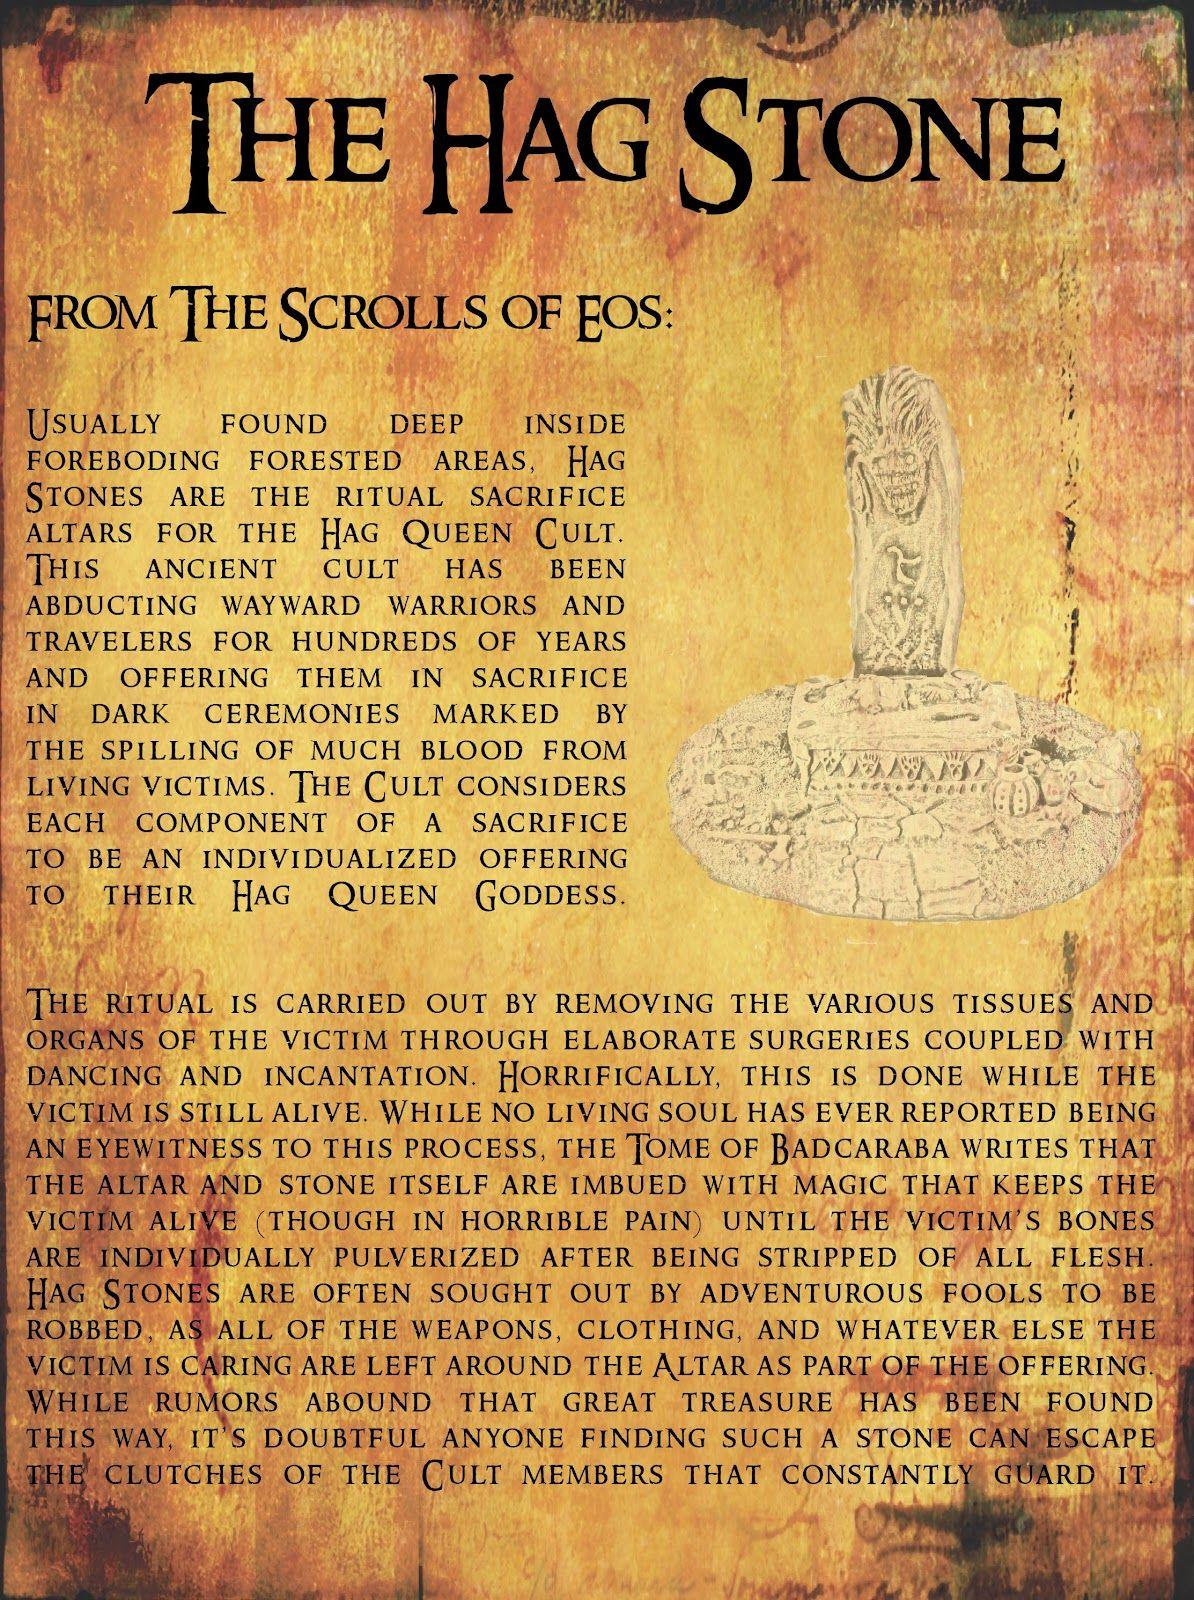 Blog Not Found Hag Stones Book Of Shadows Magical Life Hagstone by john strutton подробнее. pinterest